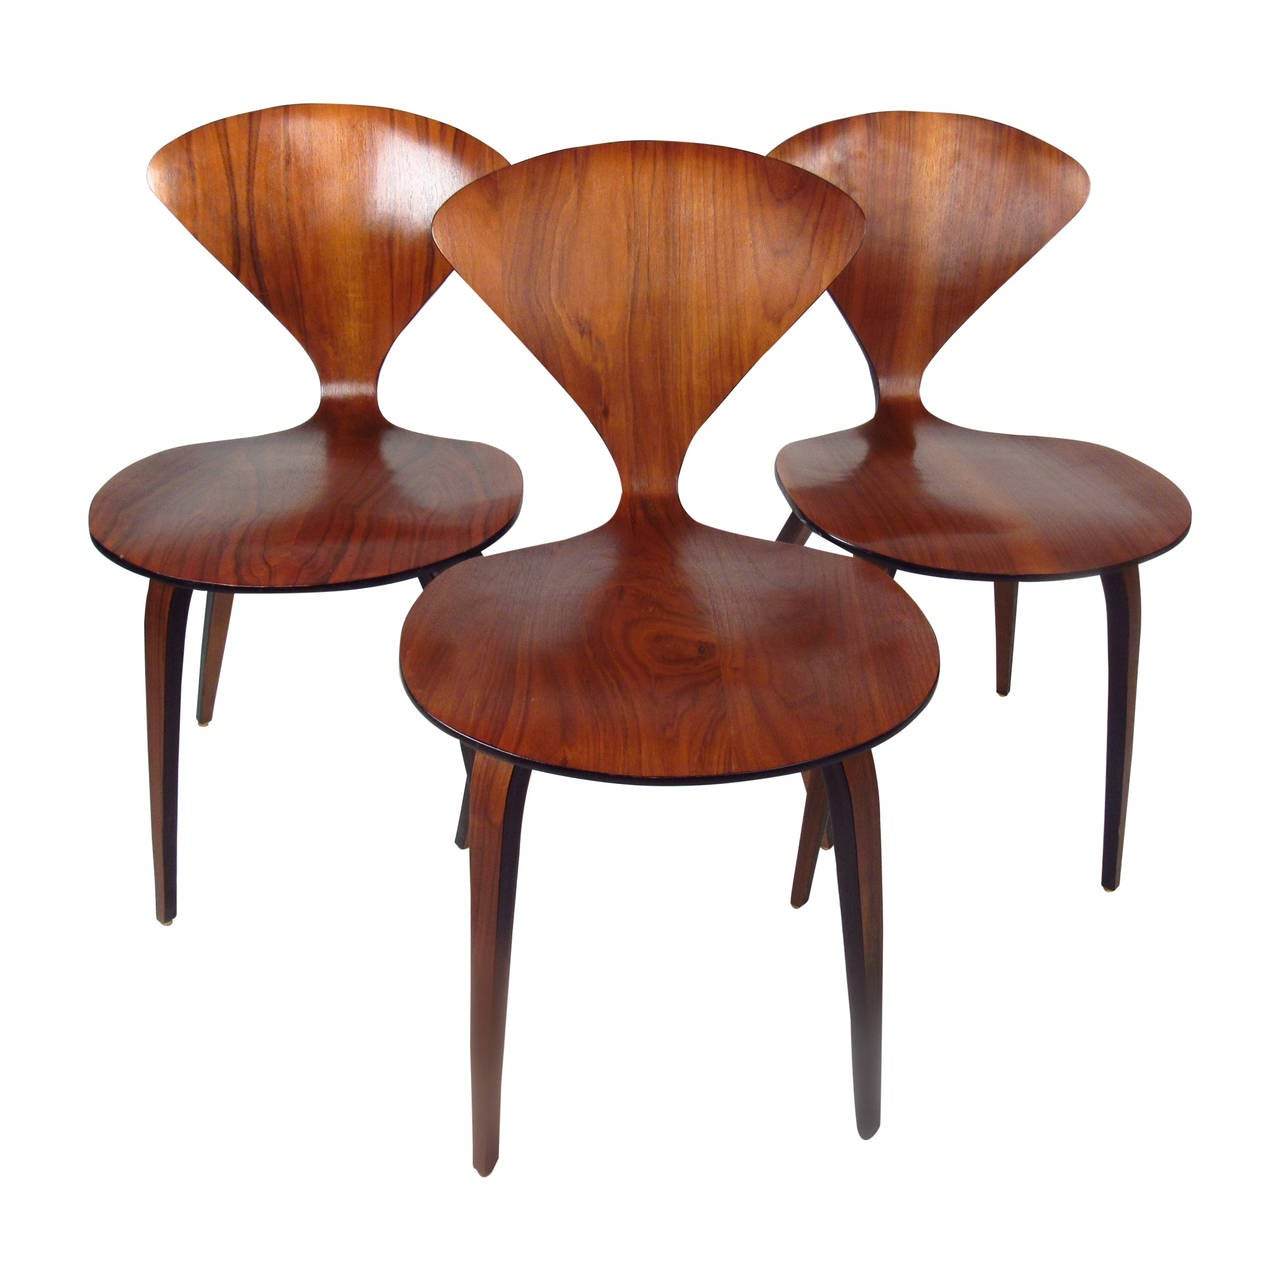 Cherner Chair for Plycraft